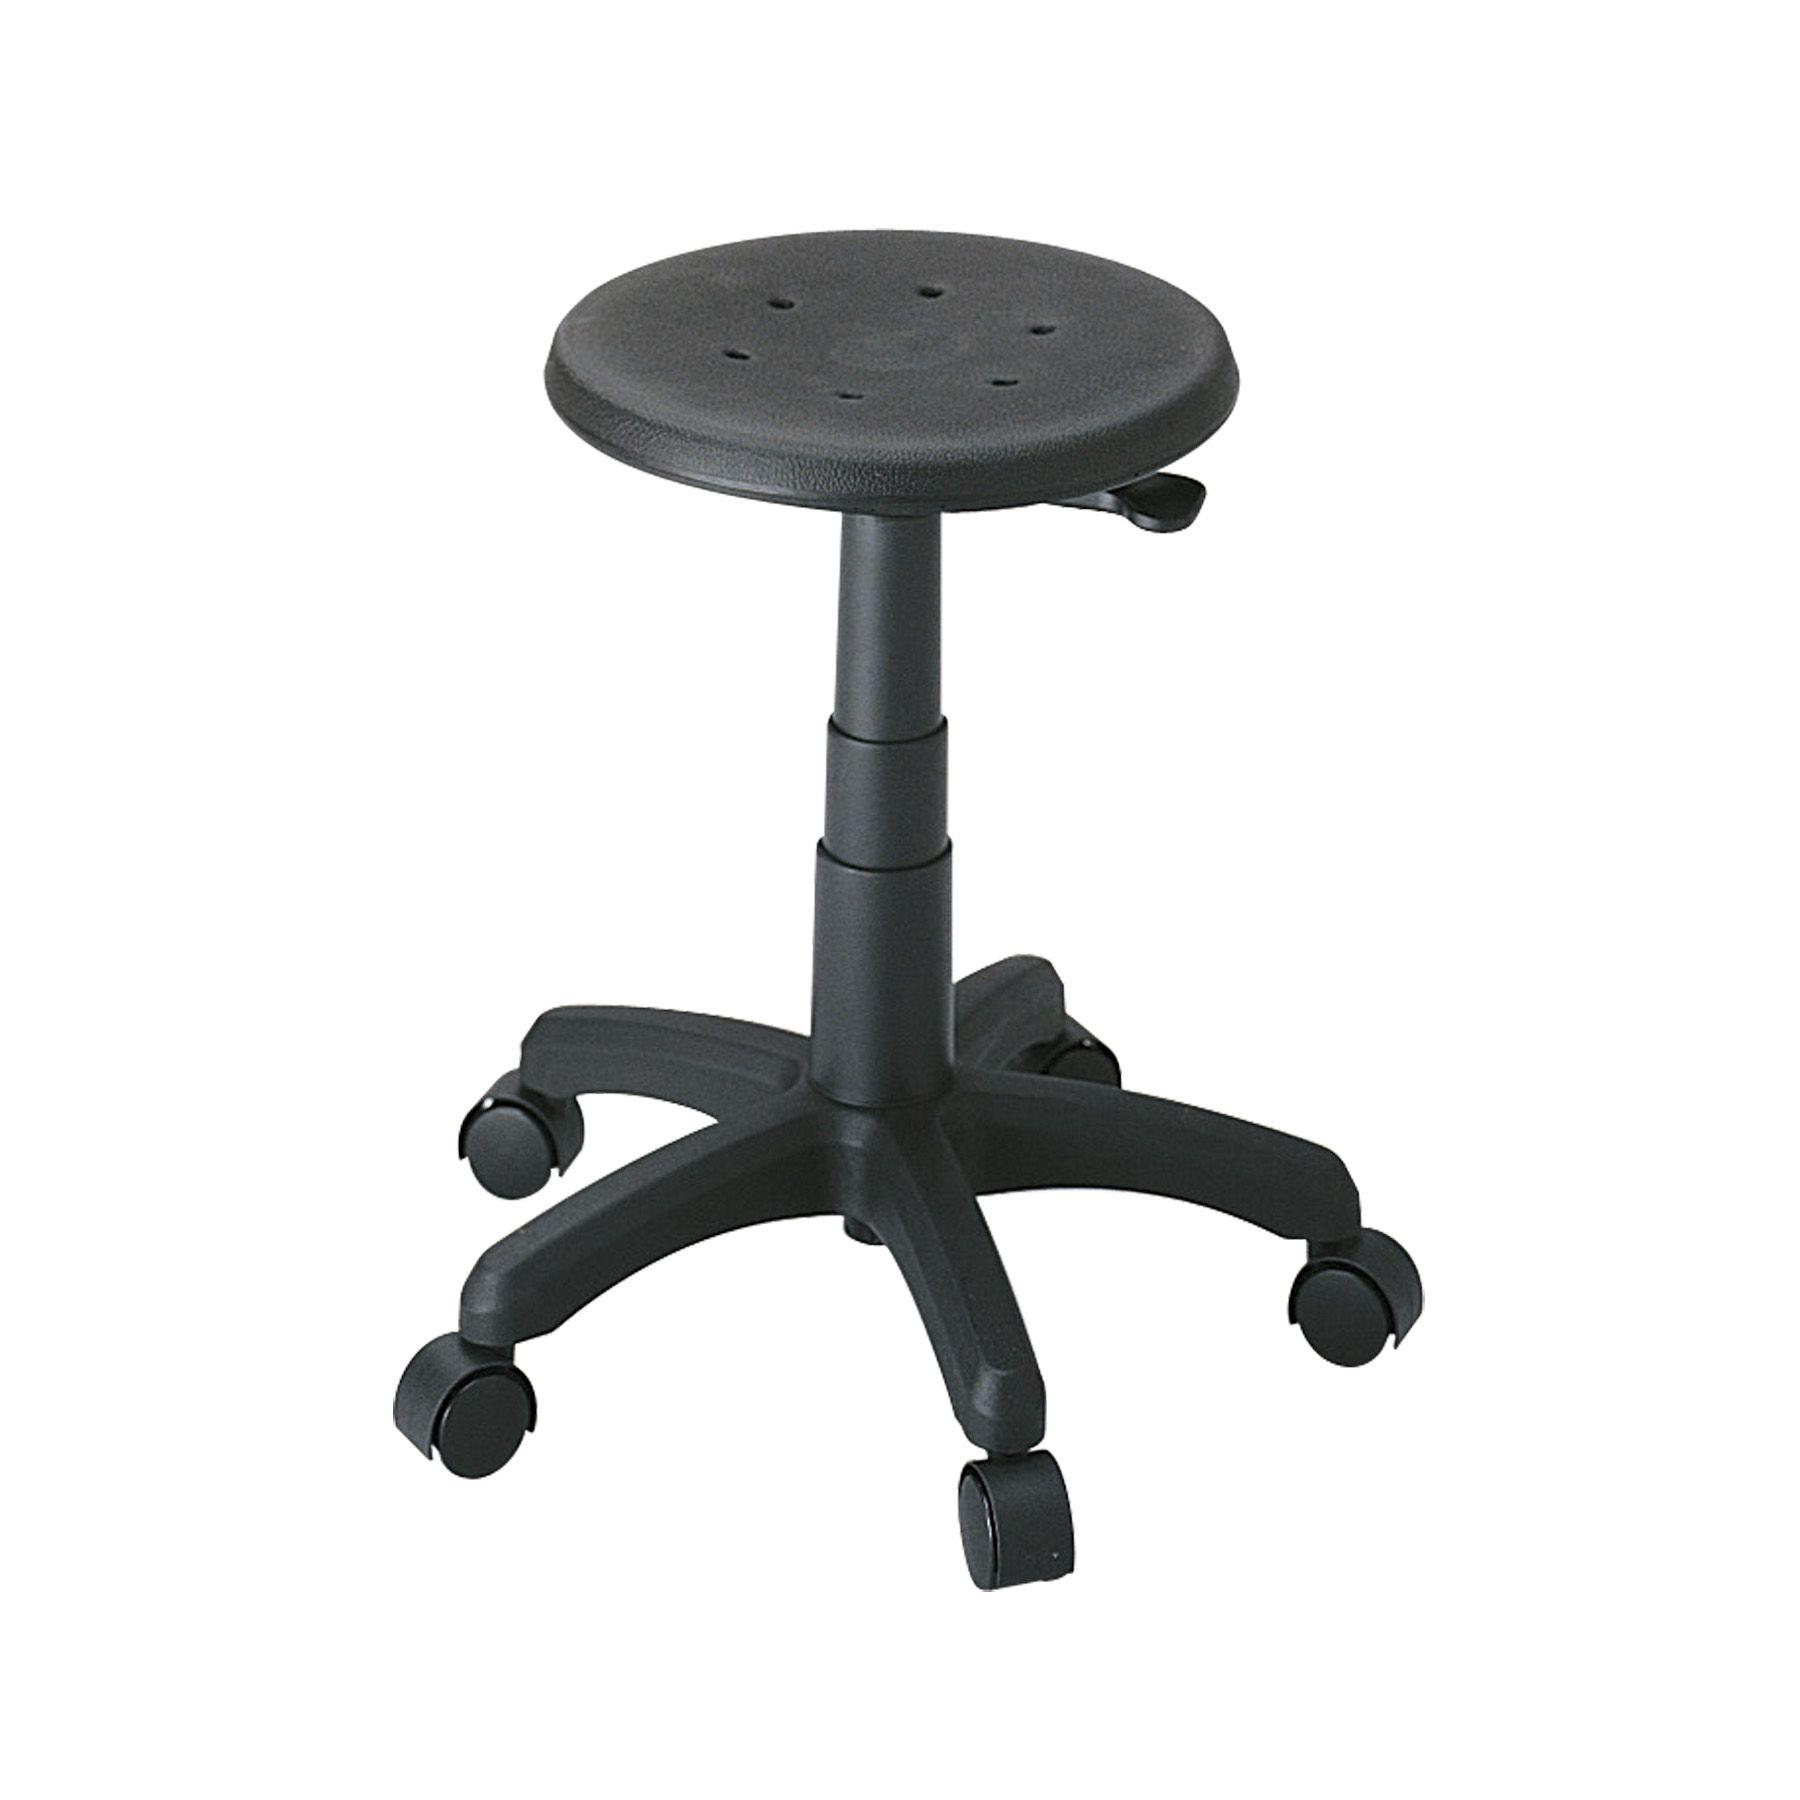 cher stools quick desk view p walnut barstool height stool